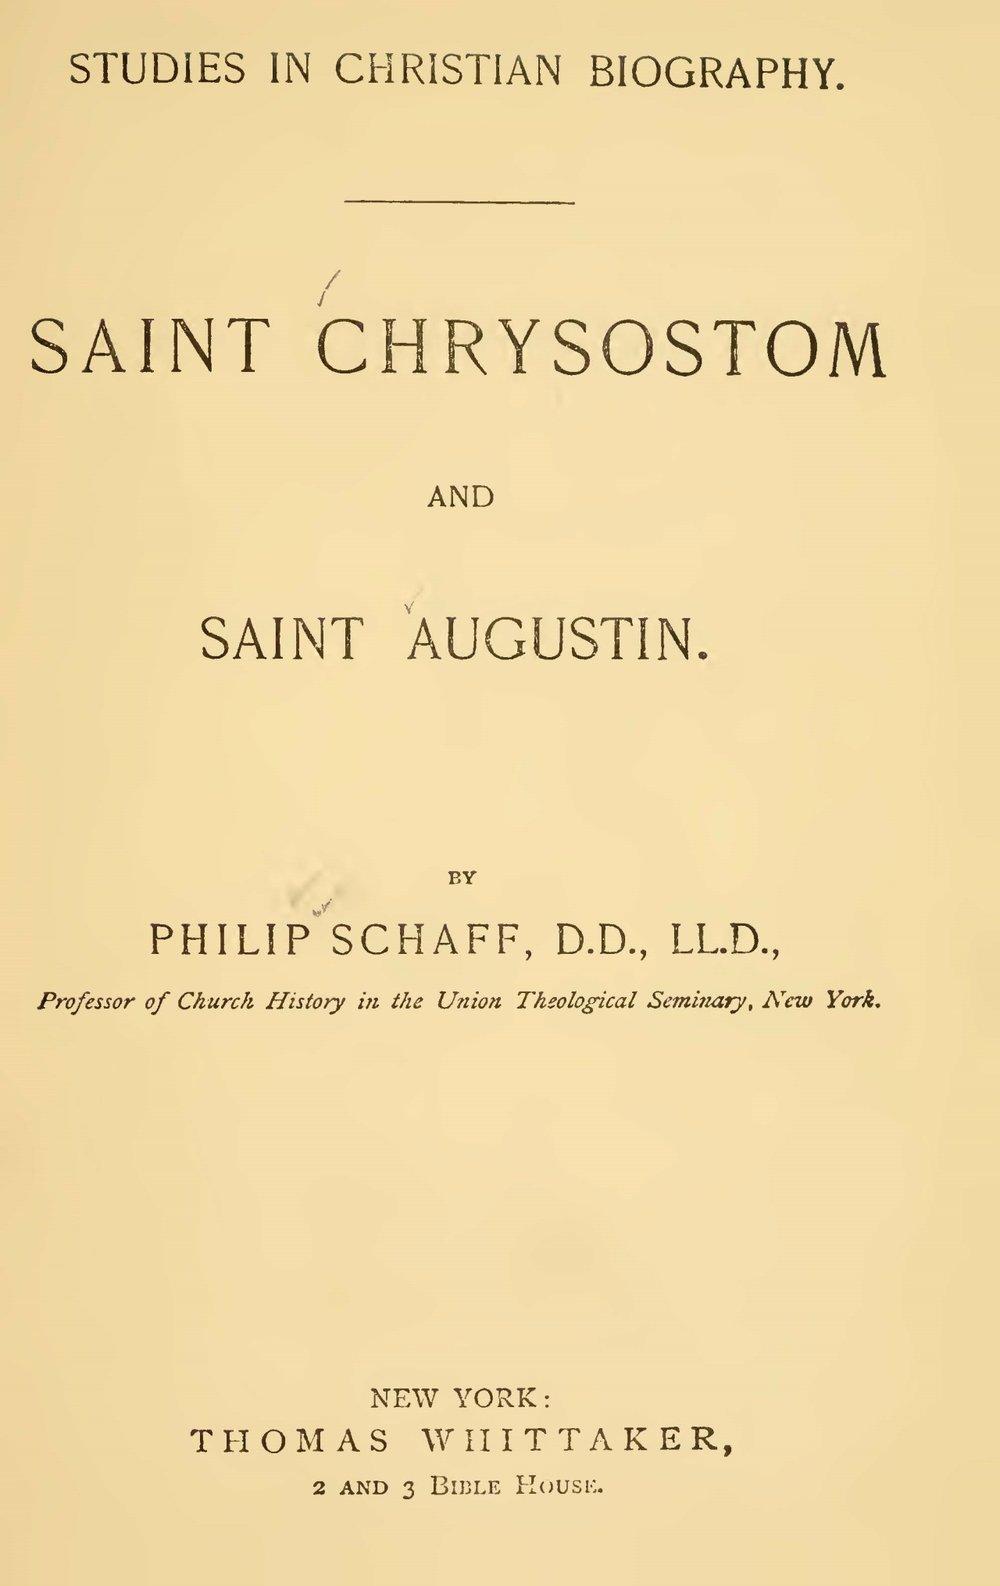 Schaff, Philip, Saint Chrysostom and Saint Augustin Title Page.jpg